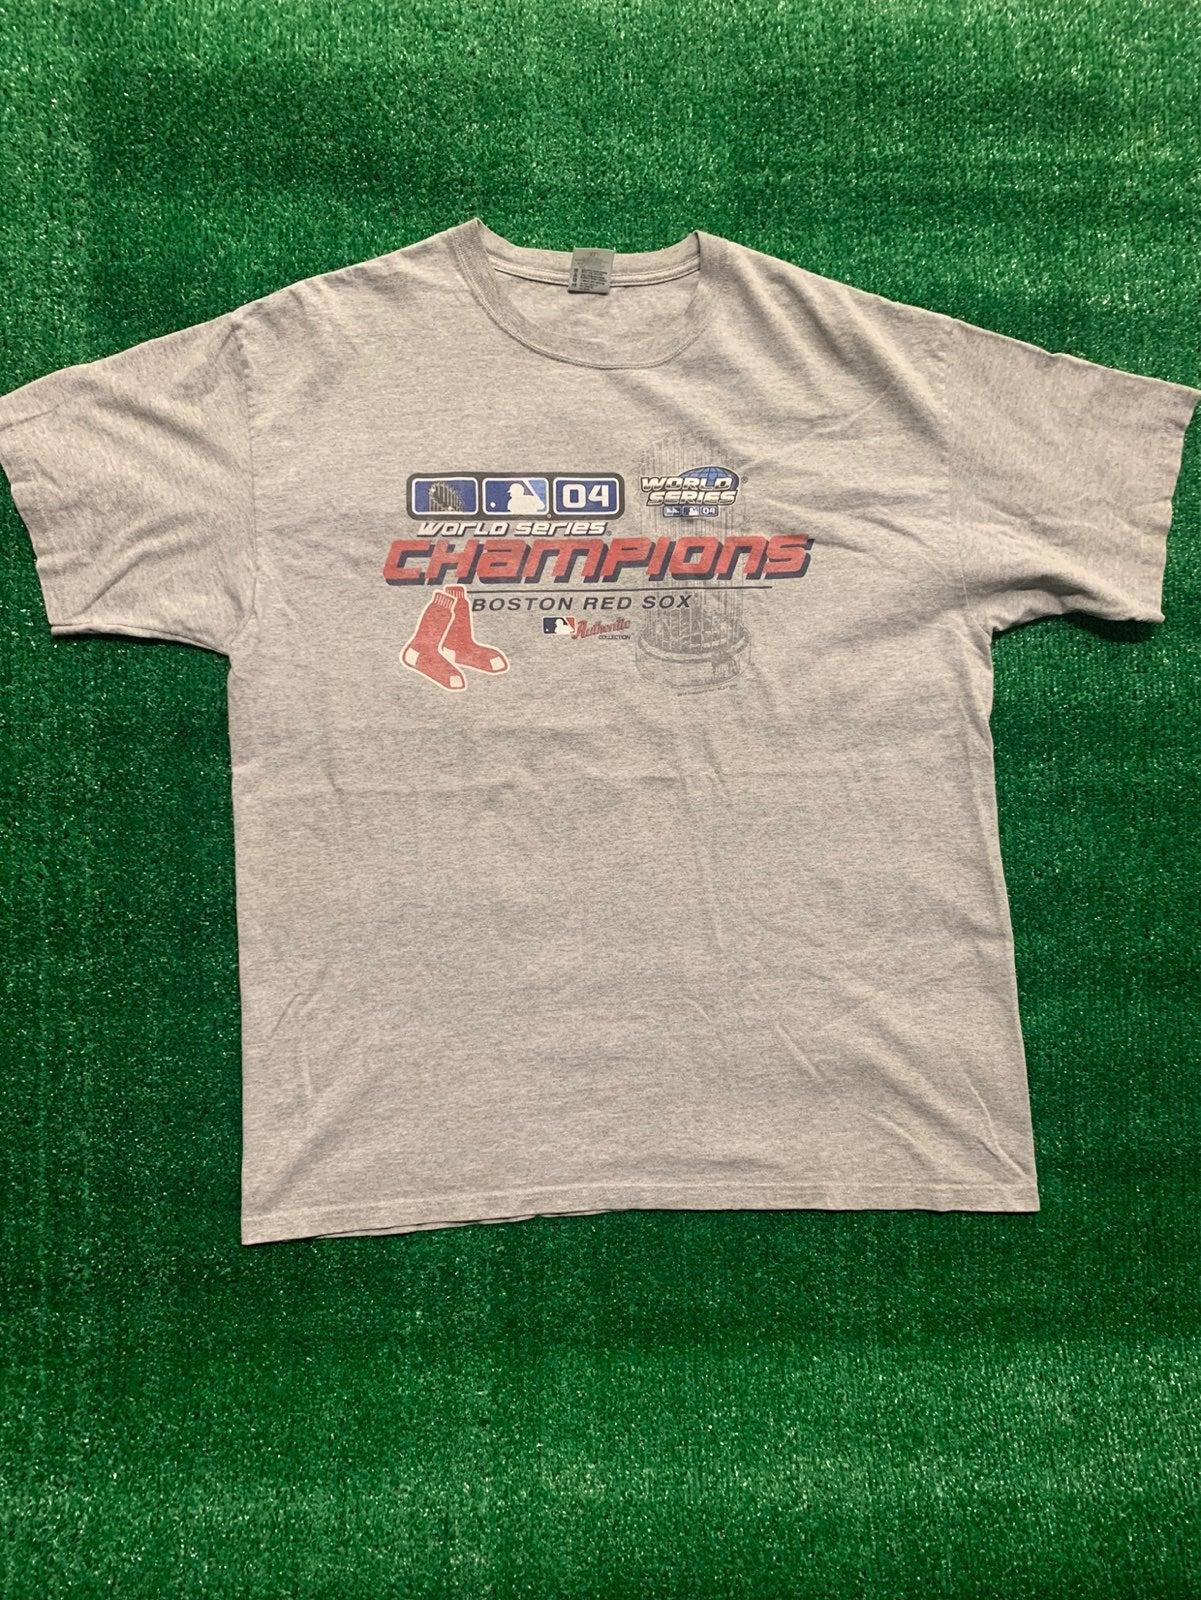 2004 World Series Boston Redsox T-Shirt